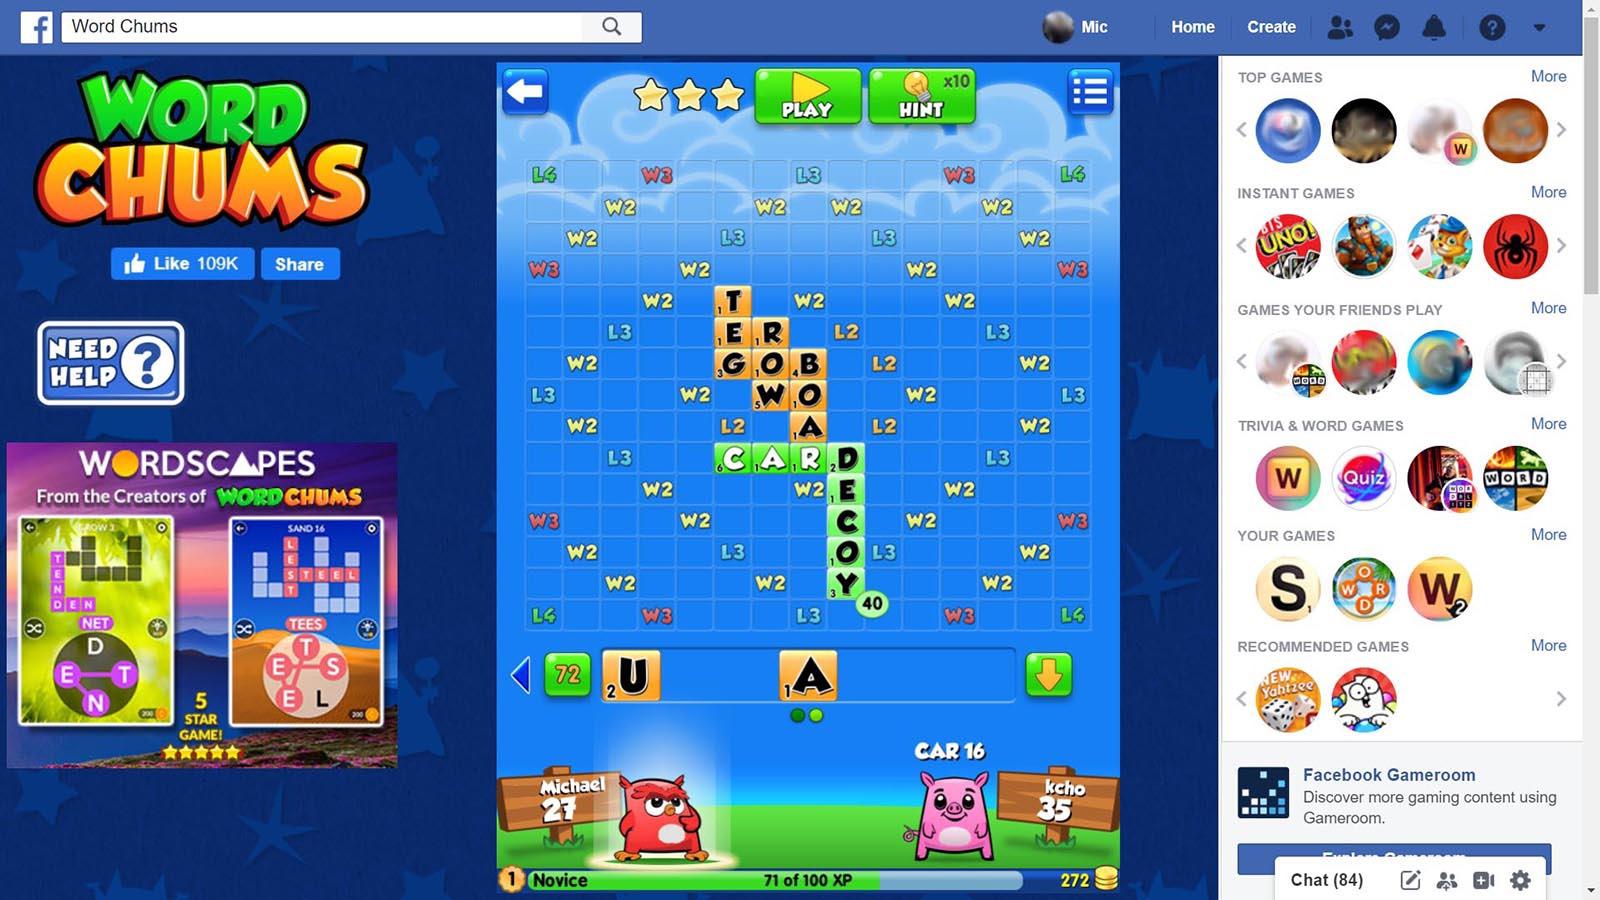 Screenshot of Word Chums game